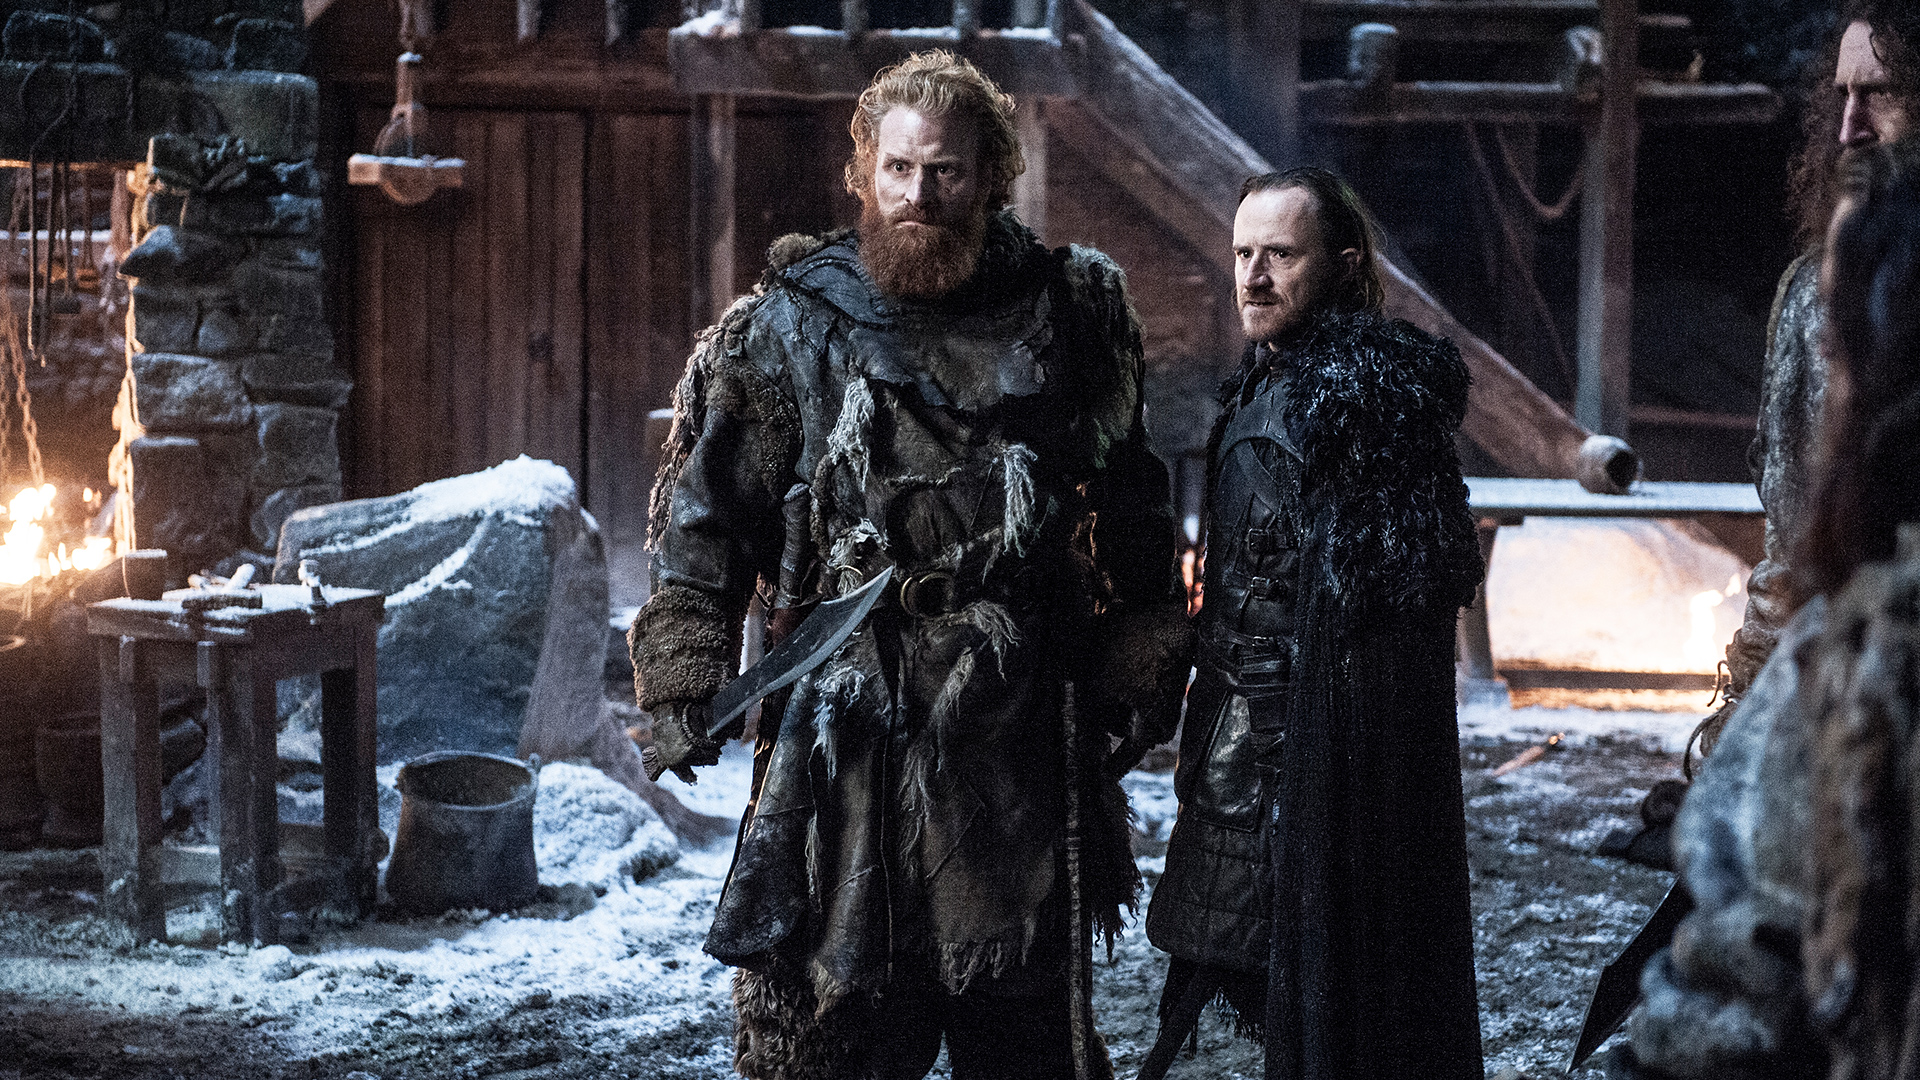 image source - HBO